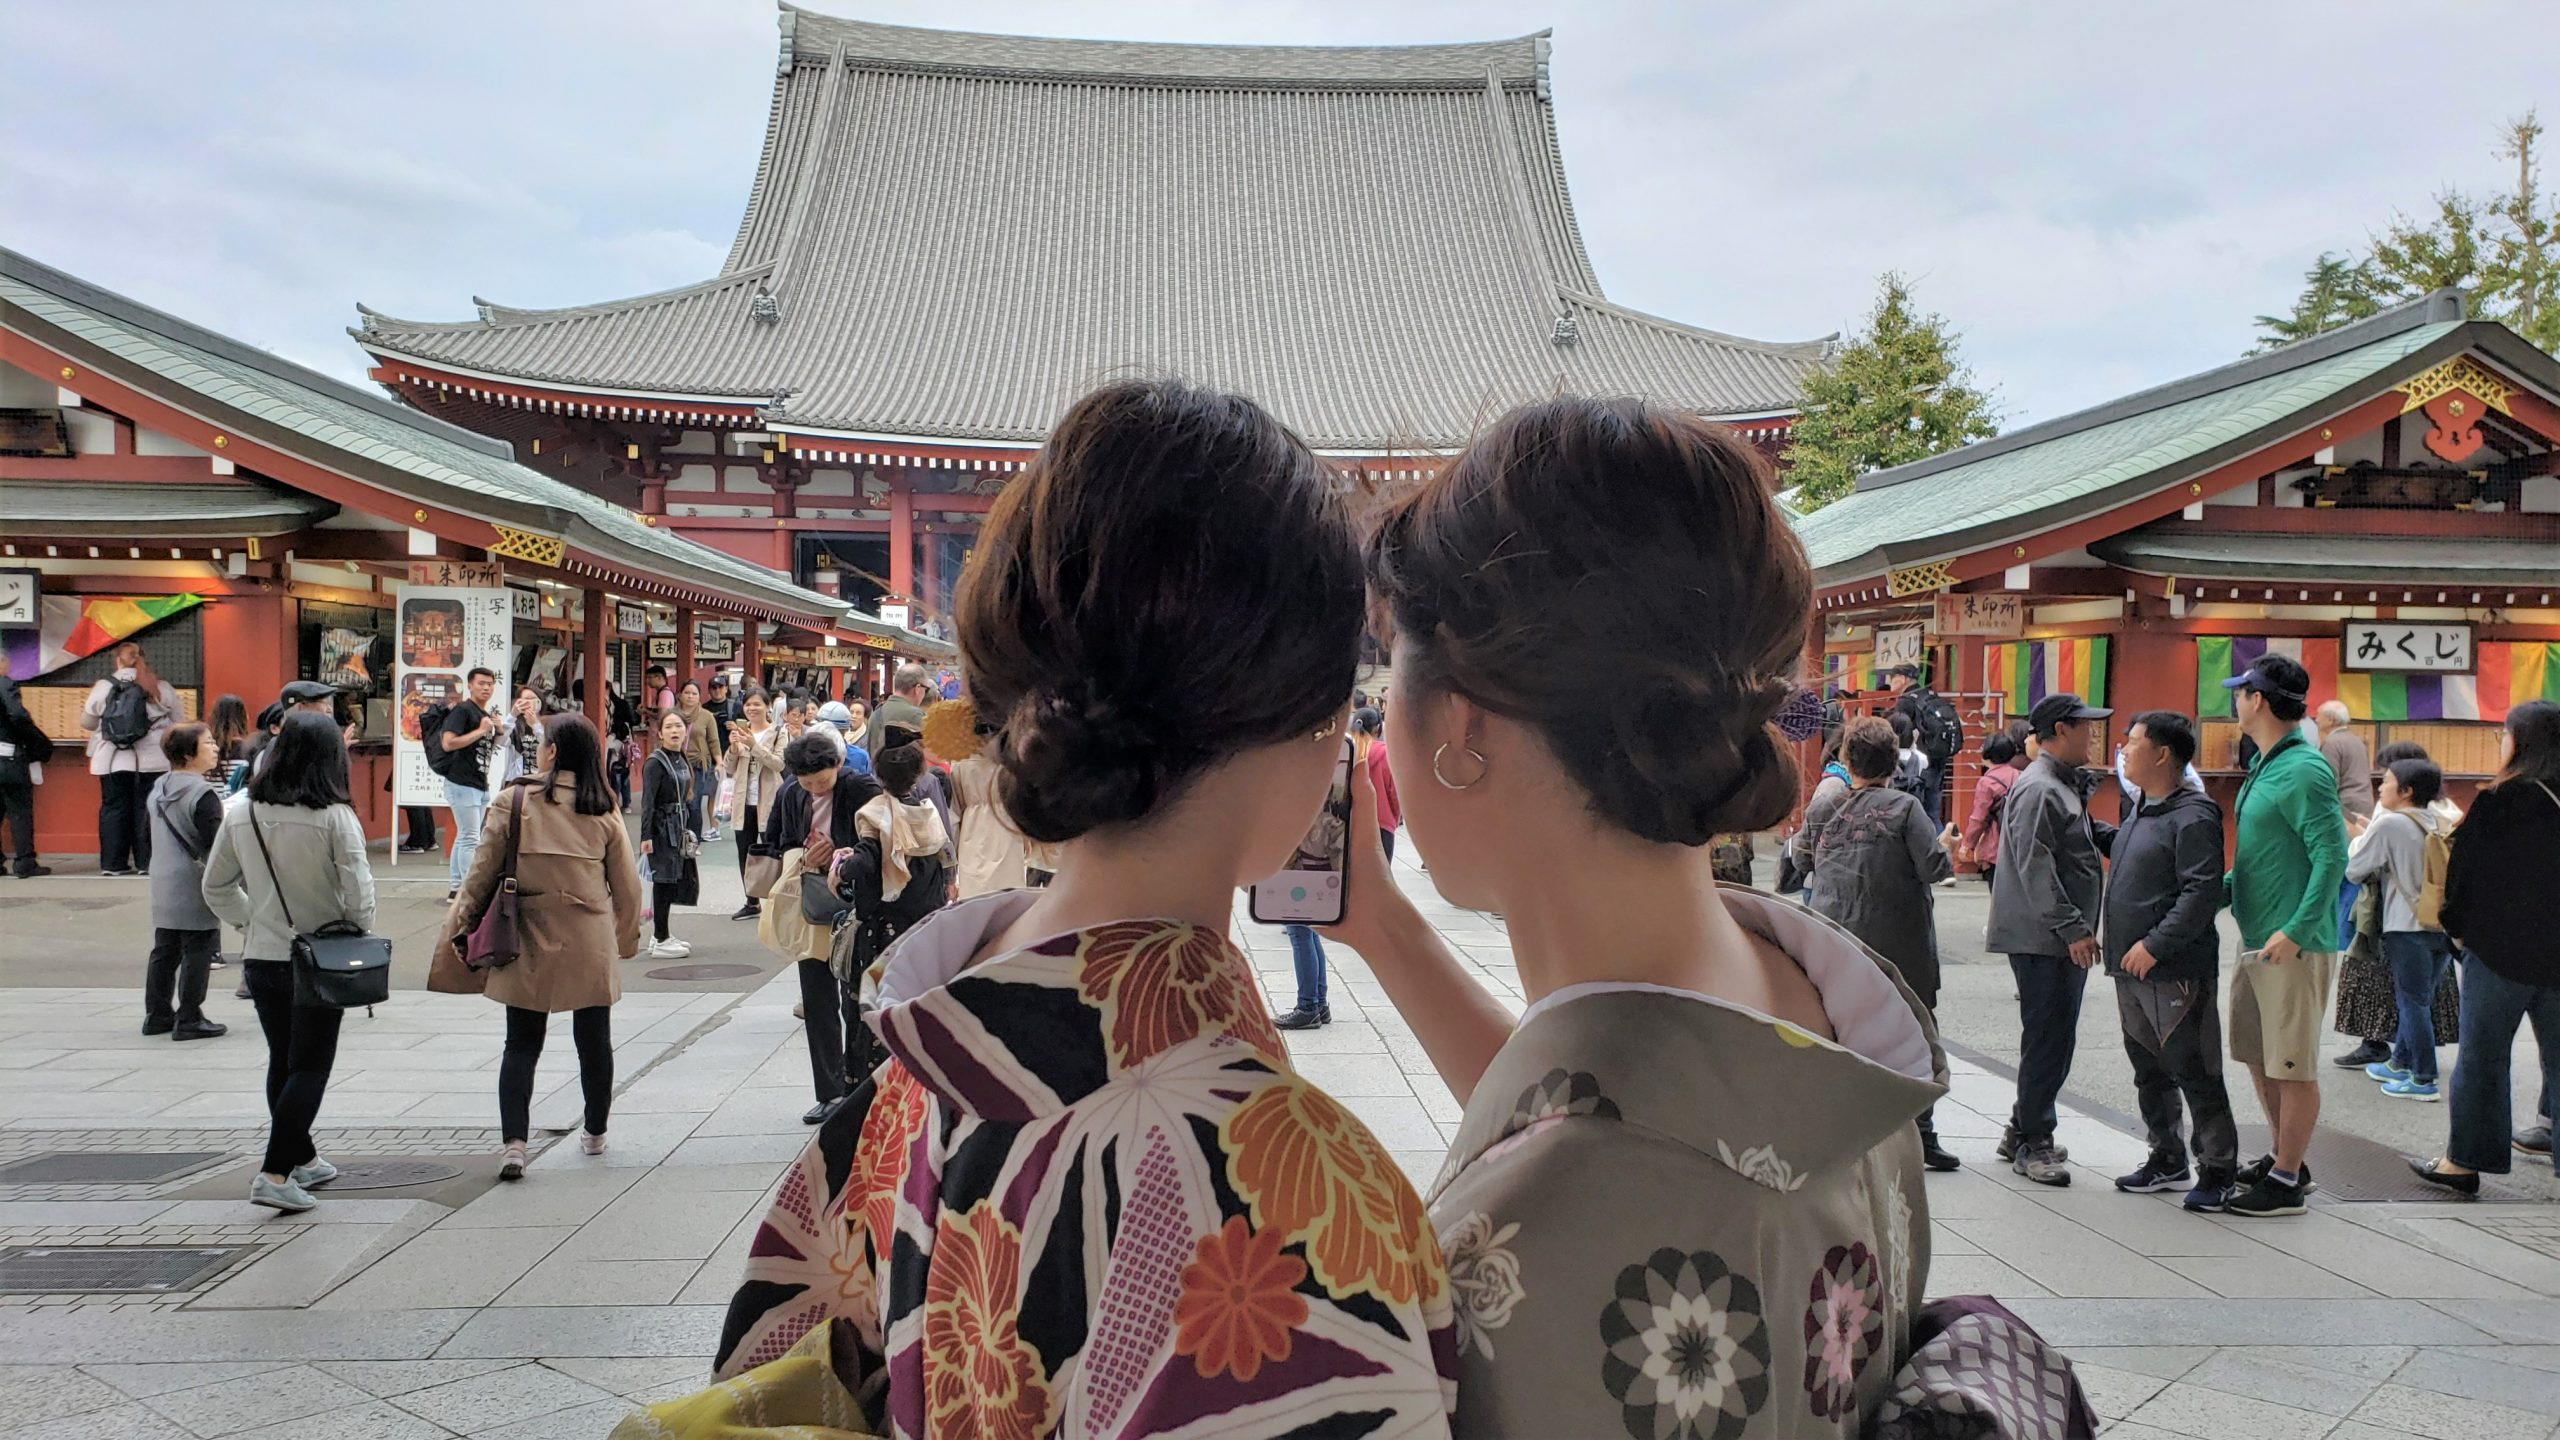 Asakusa, Tokyo - two women in kimono